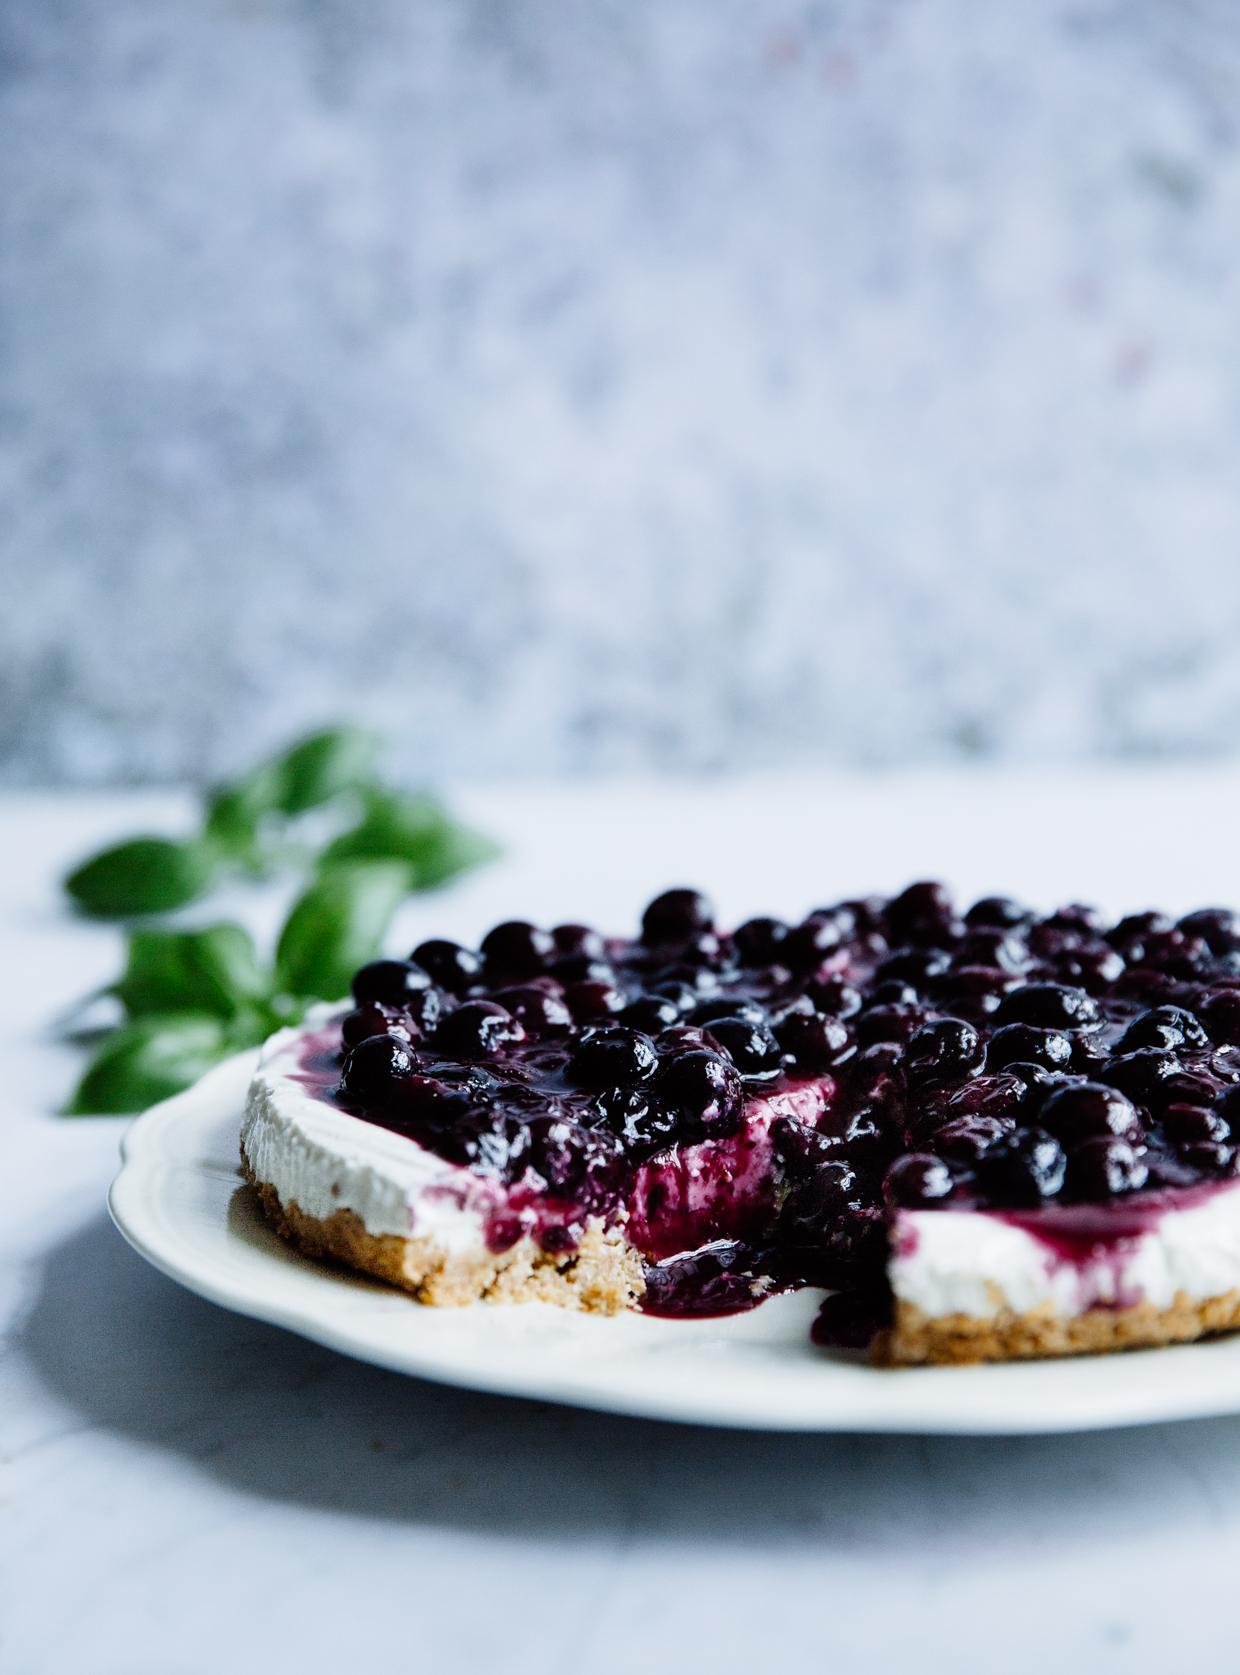 Blueberry, basil & lime yogurt cheesecake